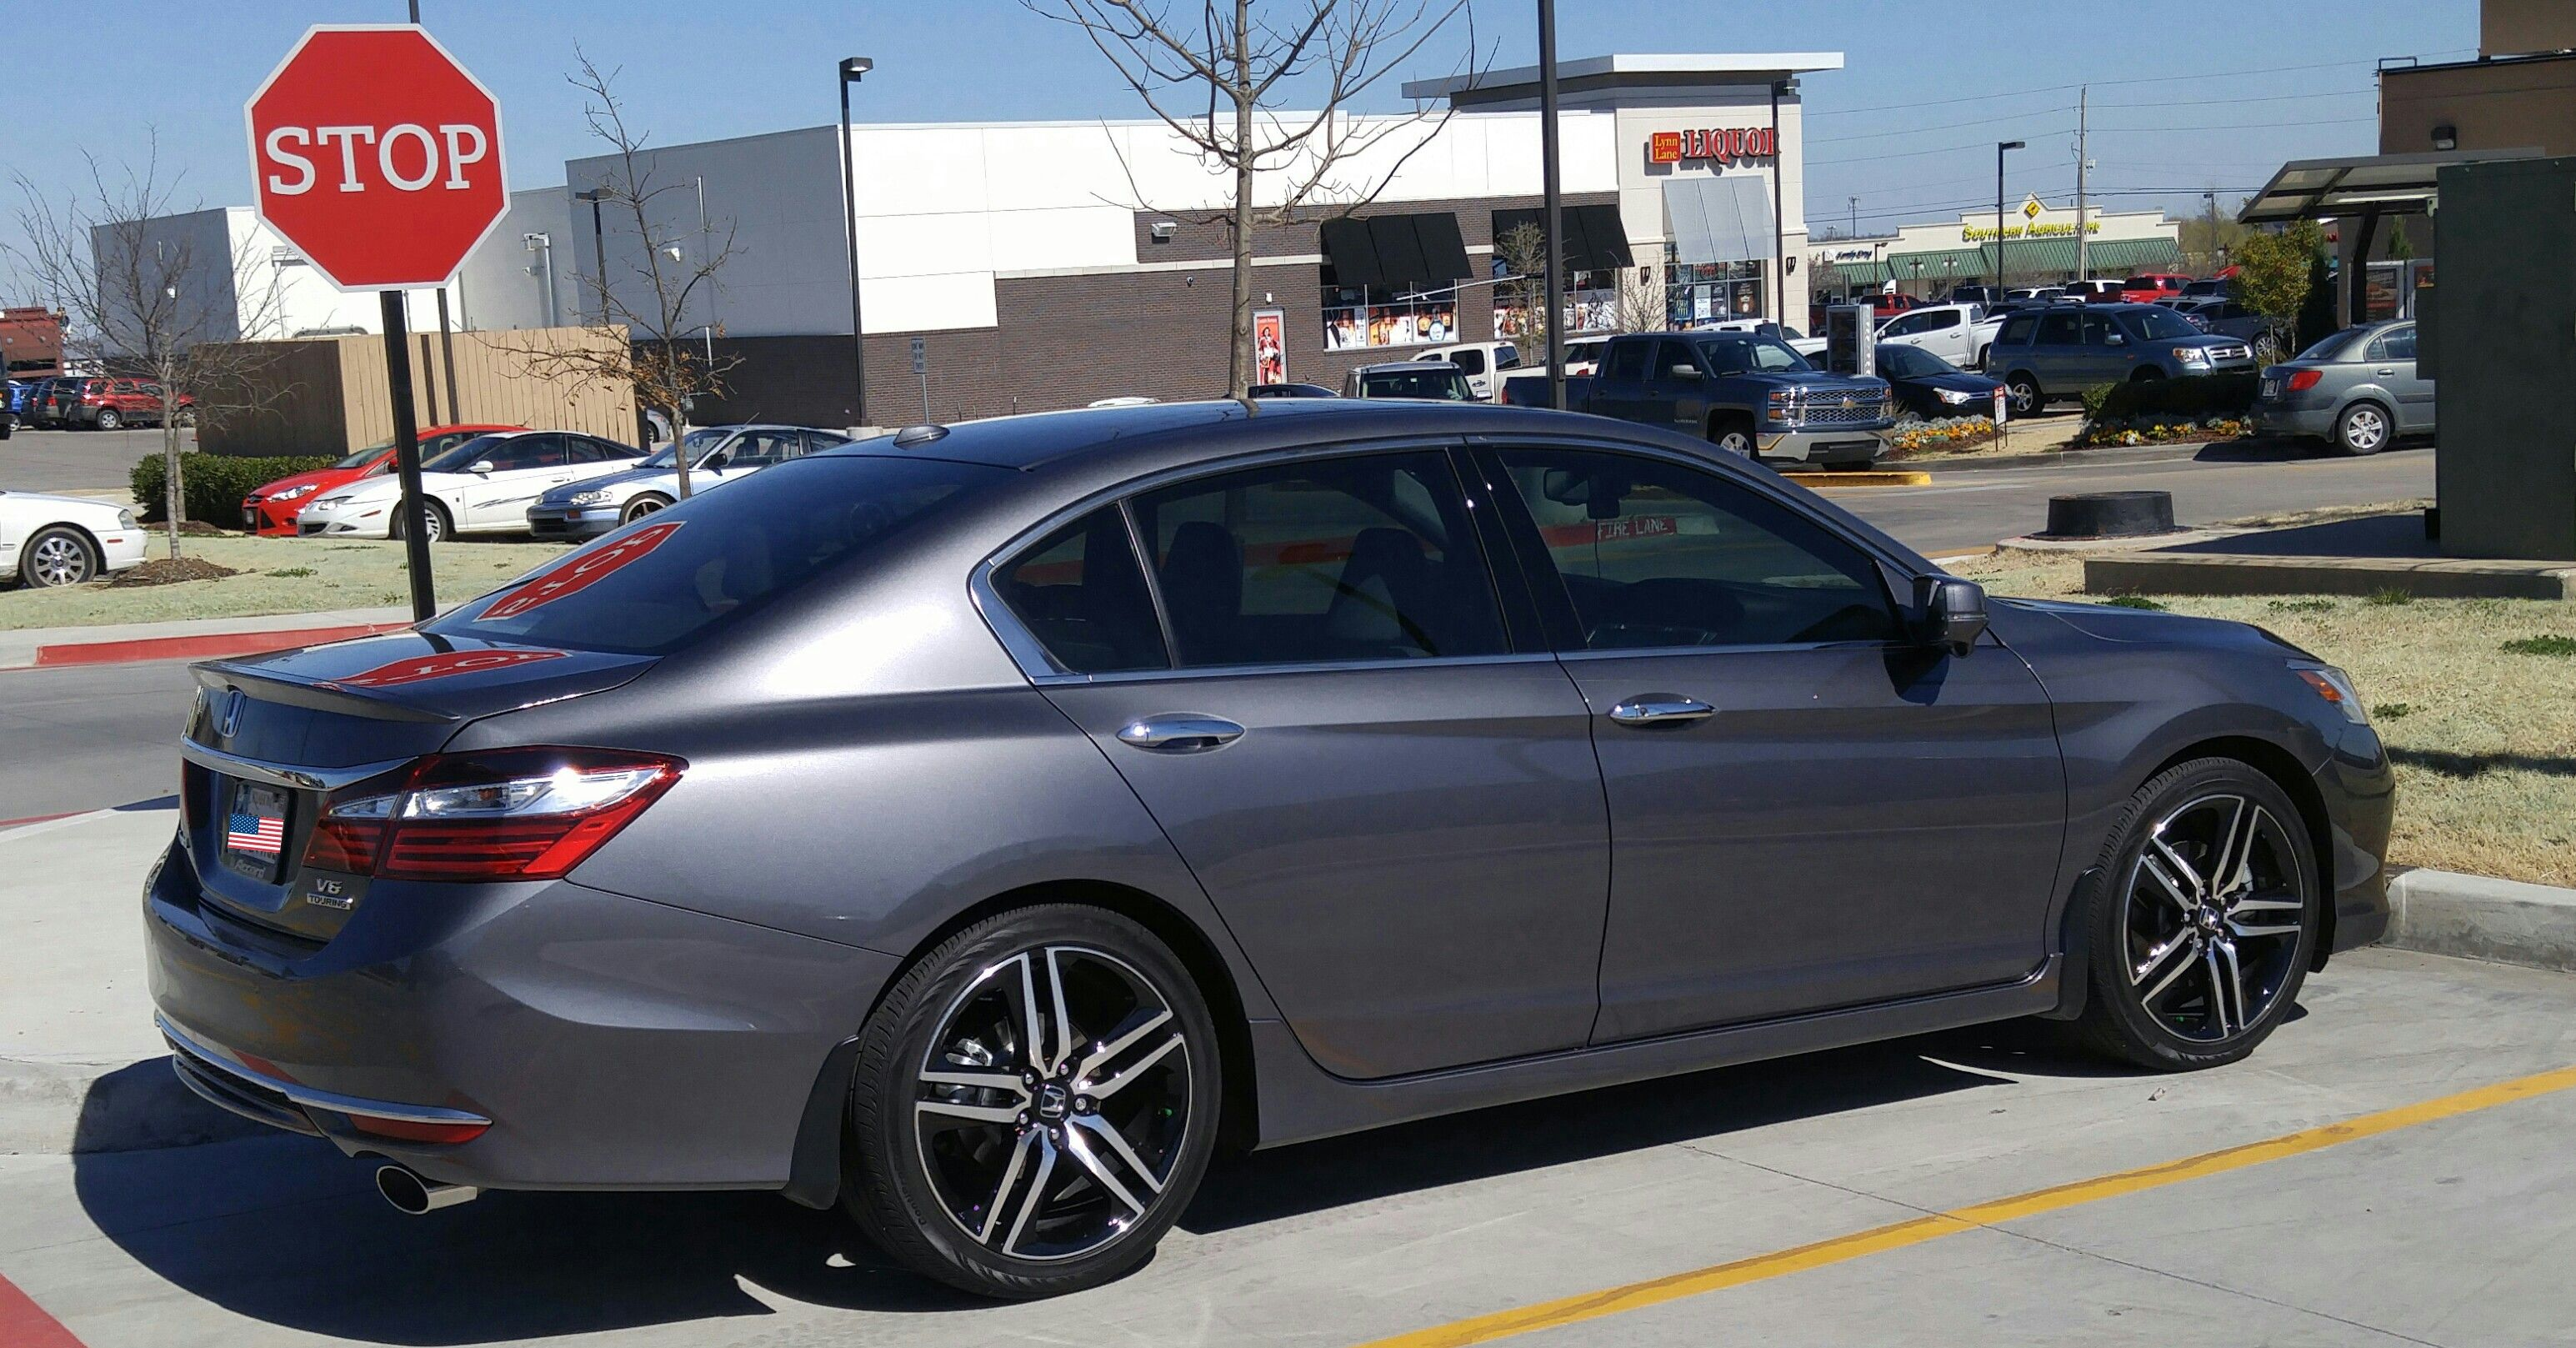 Honda Accord Sedan Honda accord, 2014 honda accord